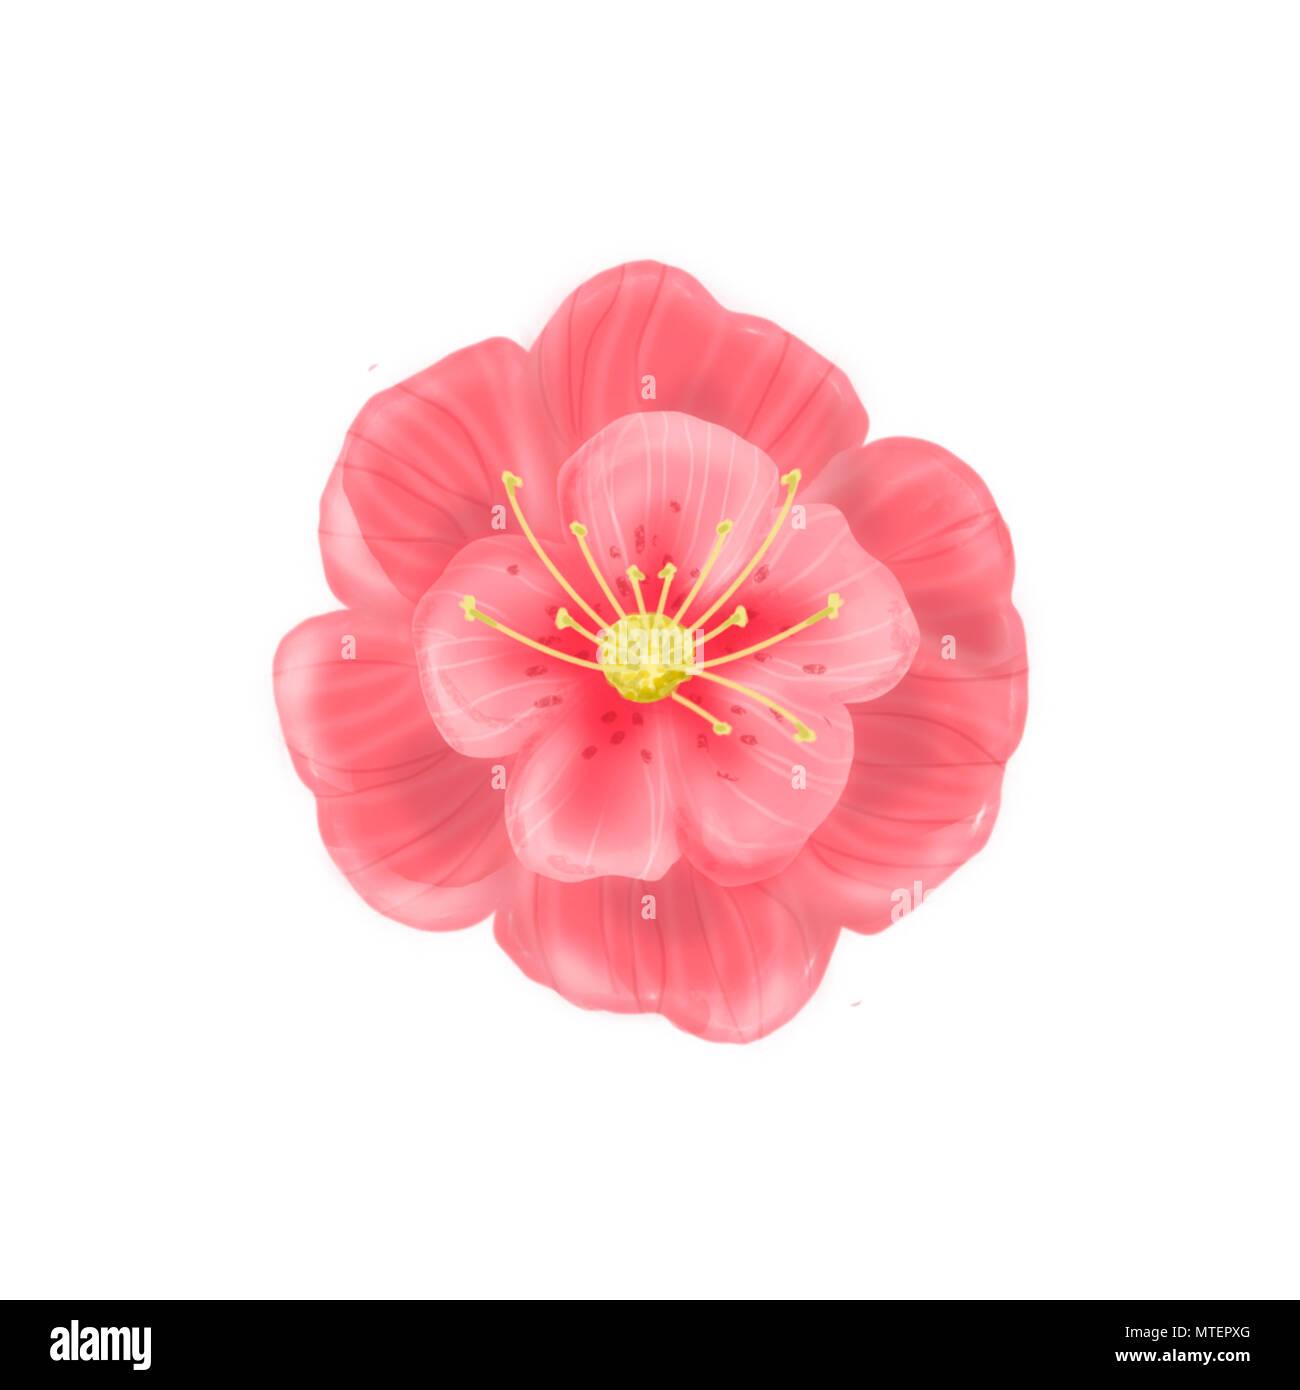 Red flower poppy buds. Poppies illustration. White background - Stock Image